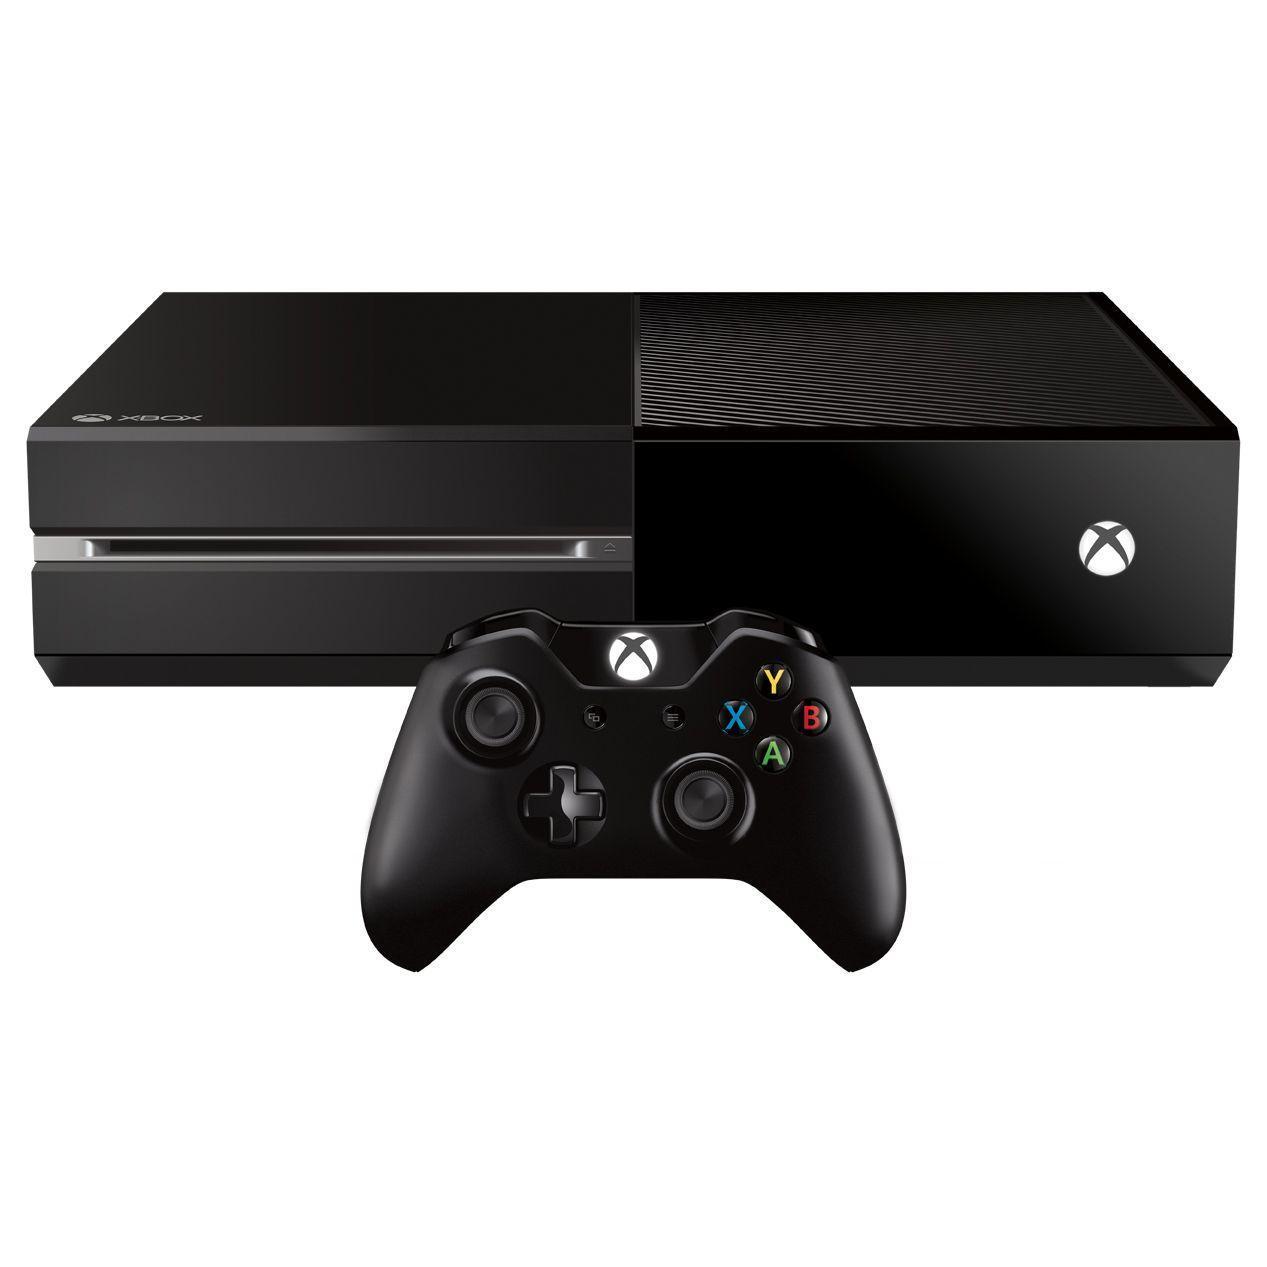 Consola de jogos Xbox One Edition Day One - Preto